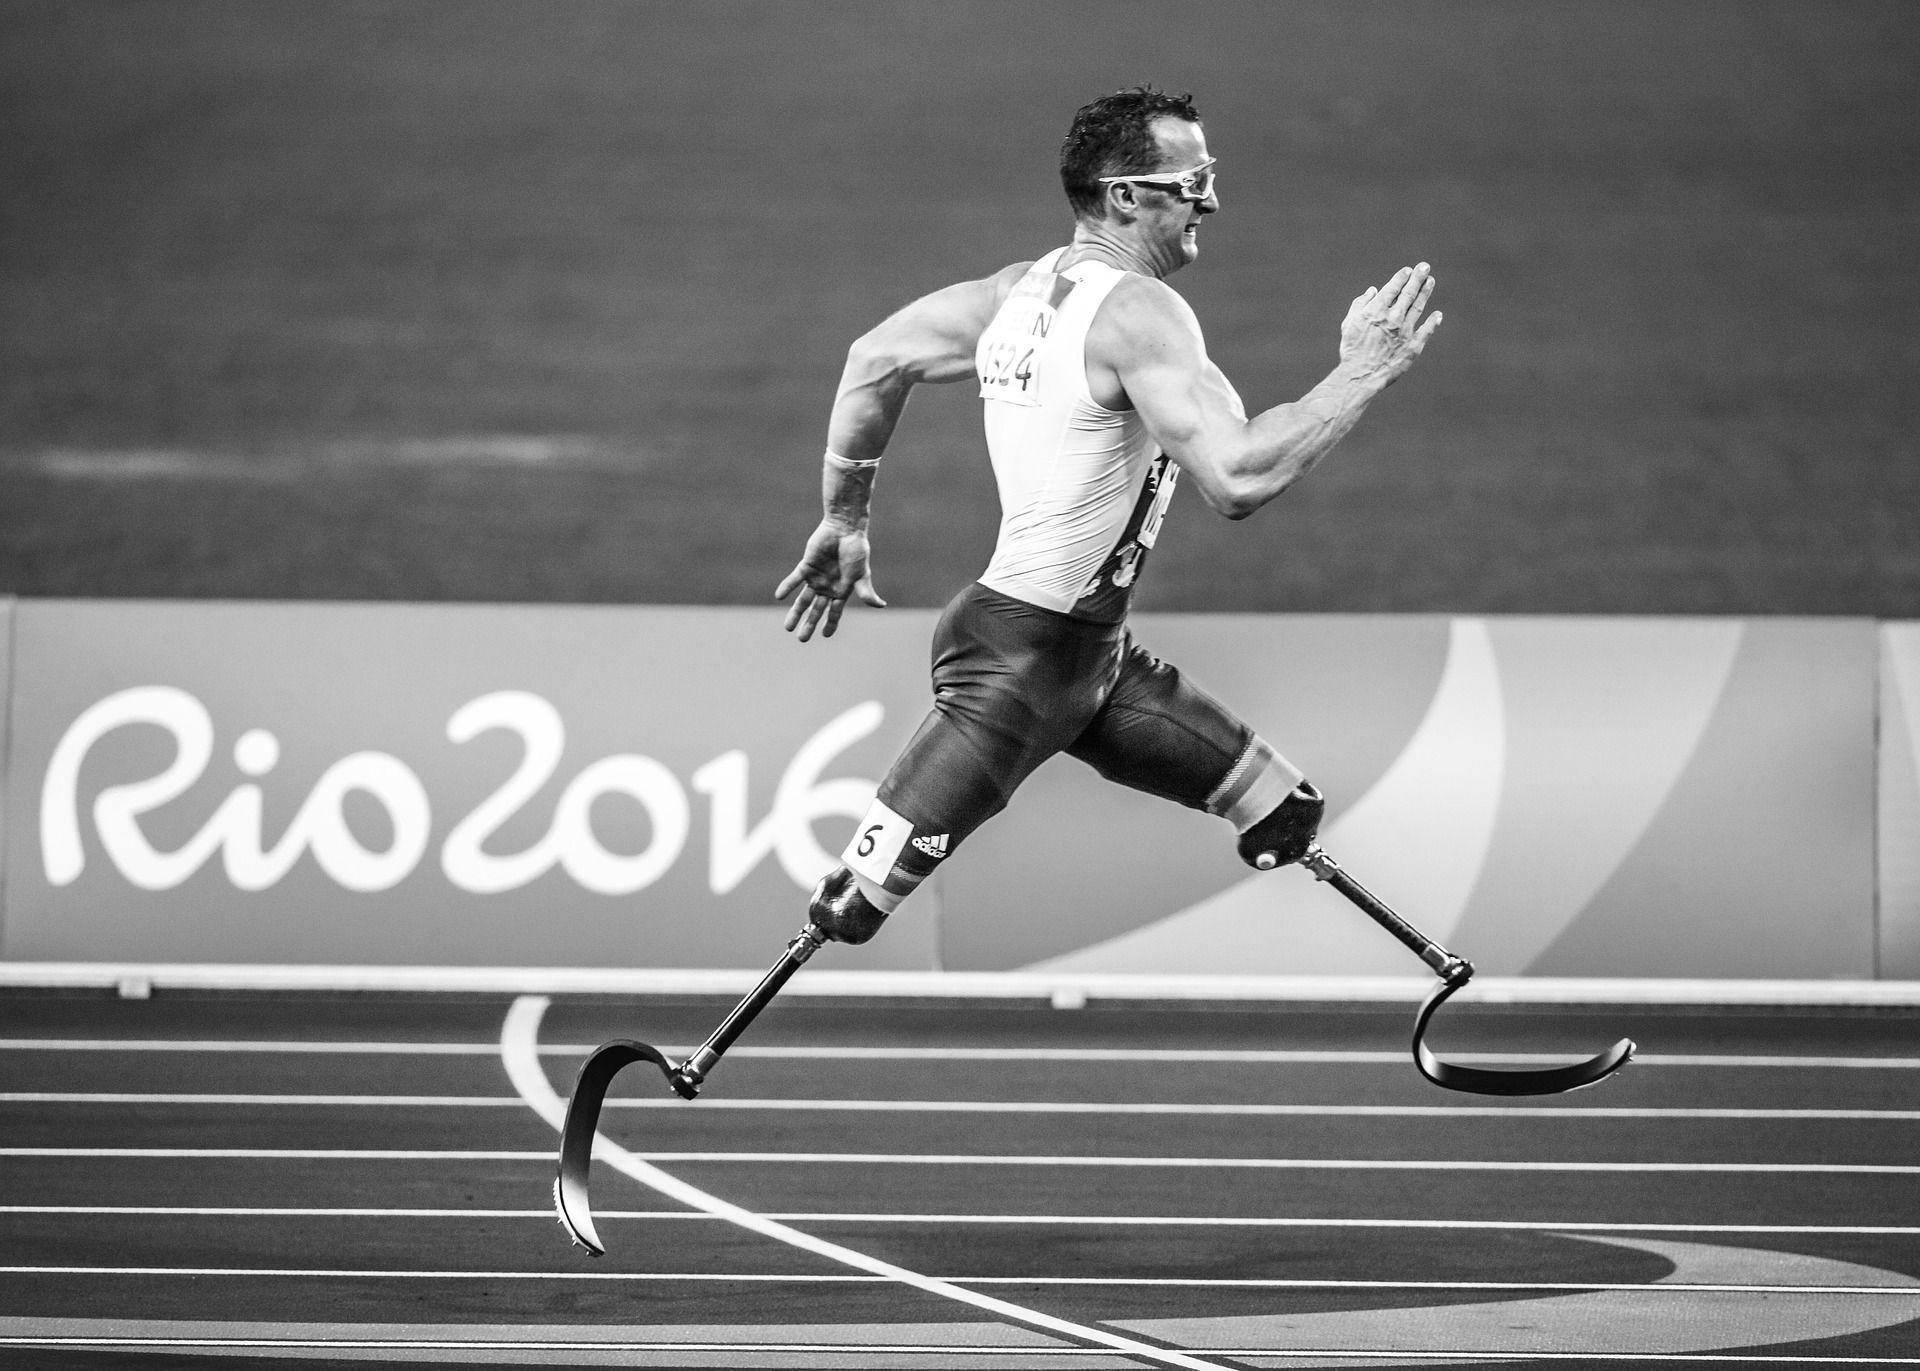 Atleta en Juegos Paralímpicos de Río de Janeiro 2016   Foto: Pexels para Pixabay